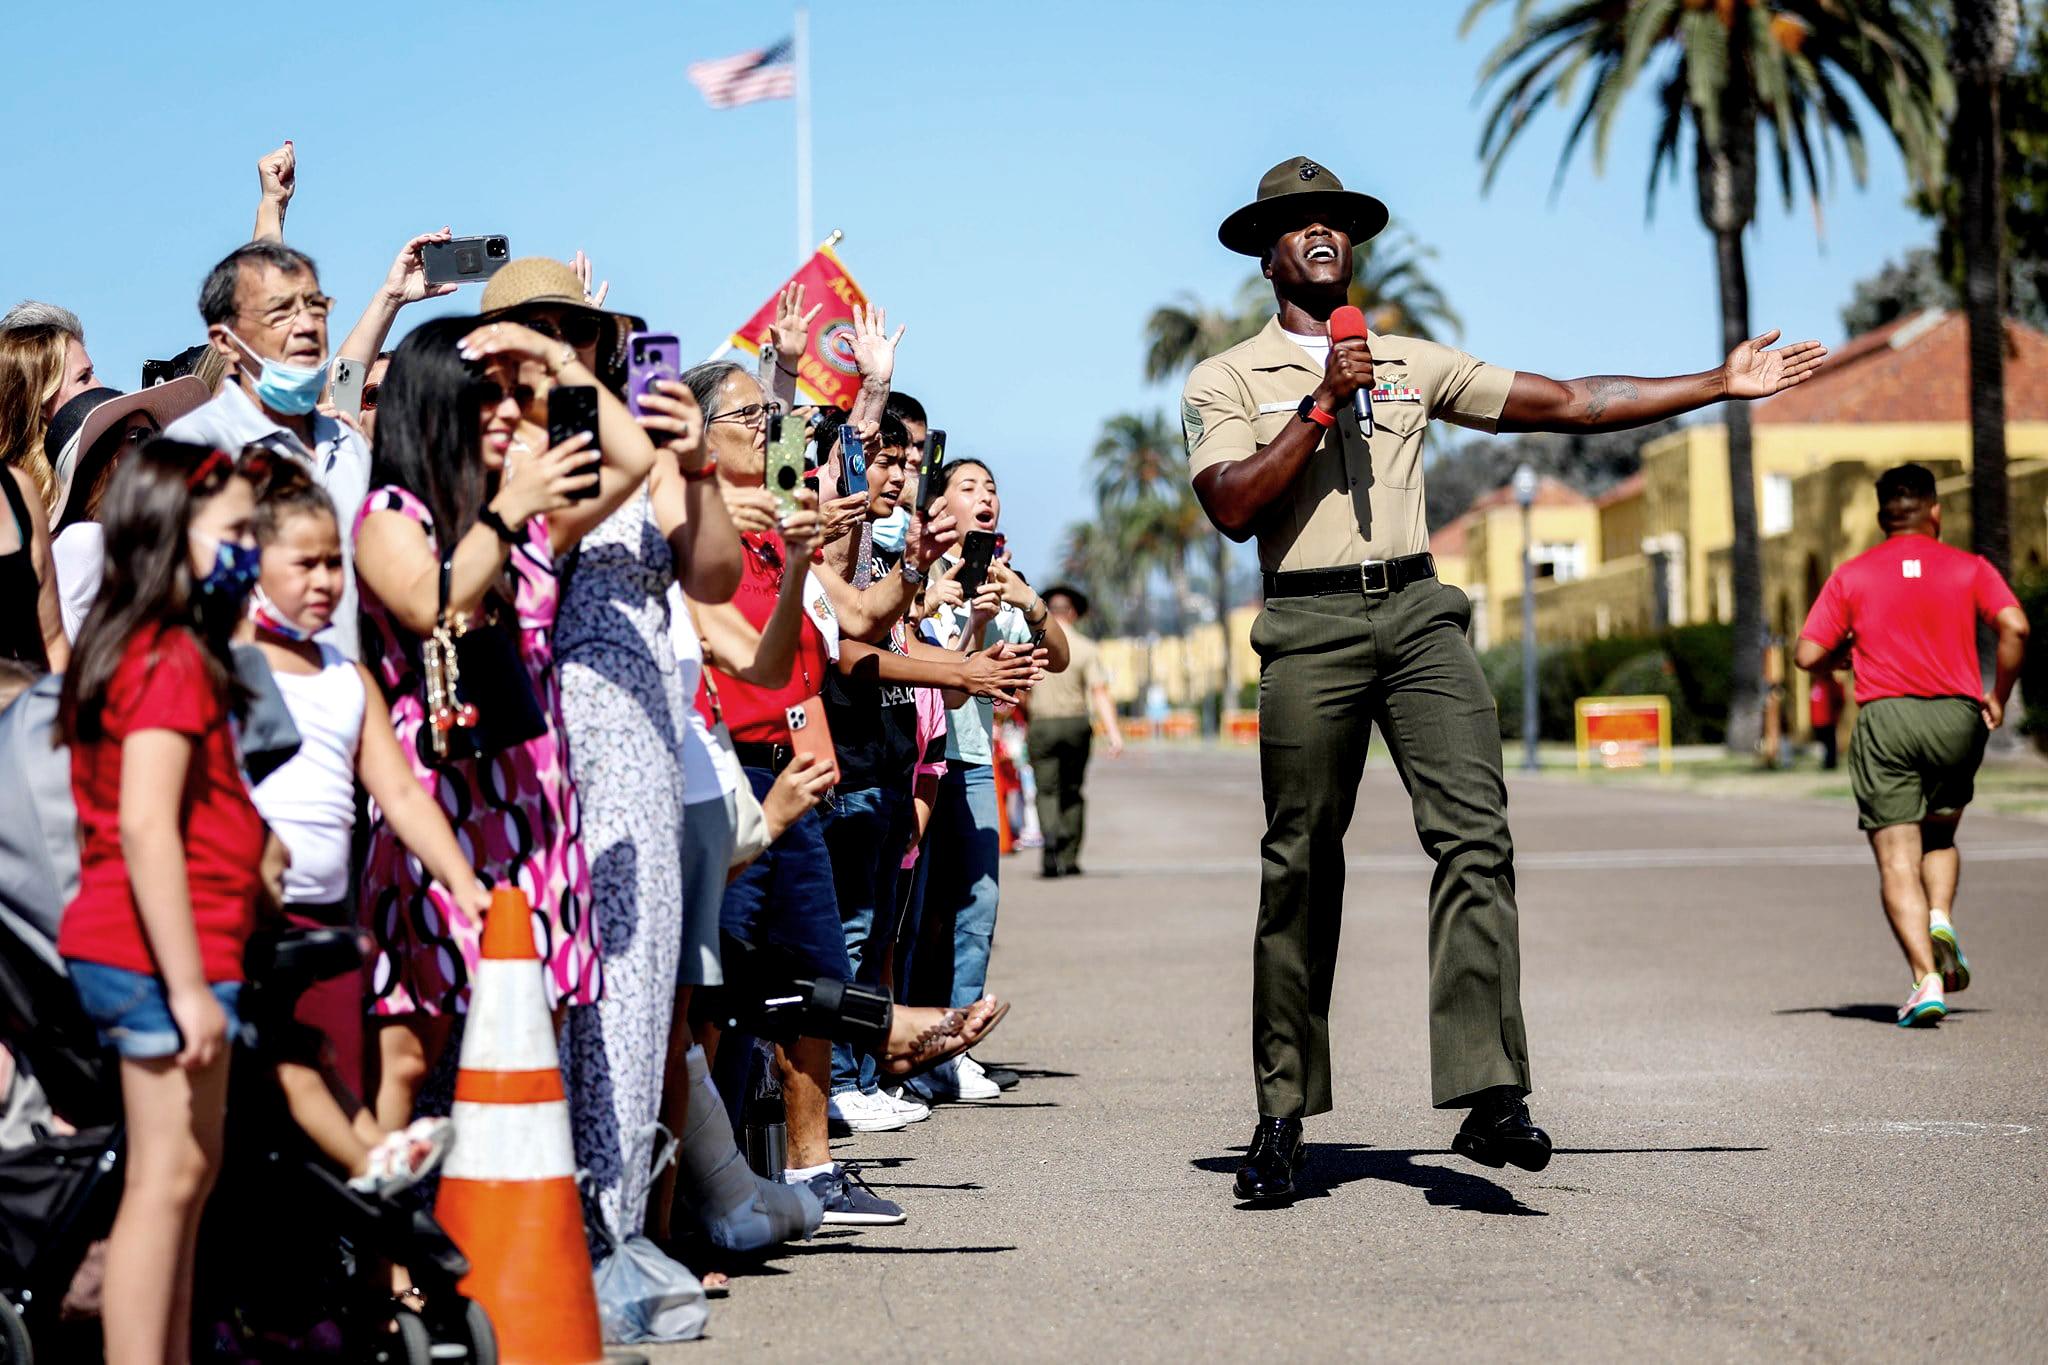 (U.S. Marine Corps photo by Cpl. Zachary T. Beatty)